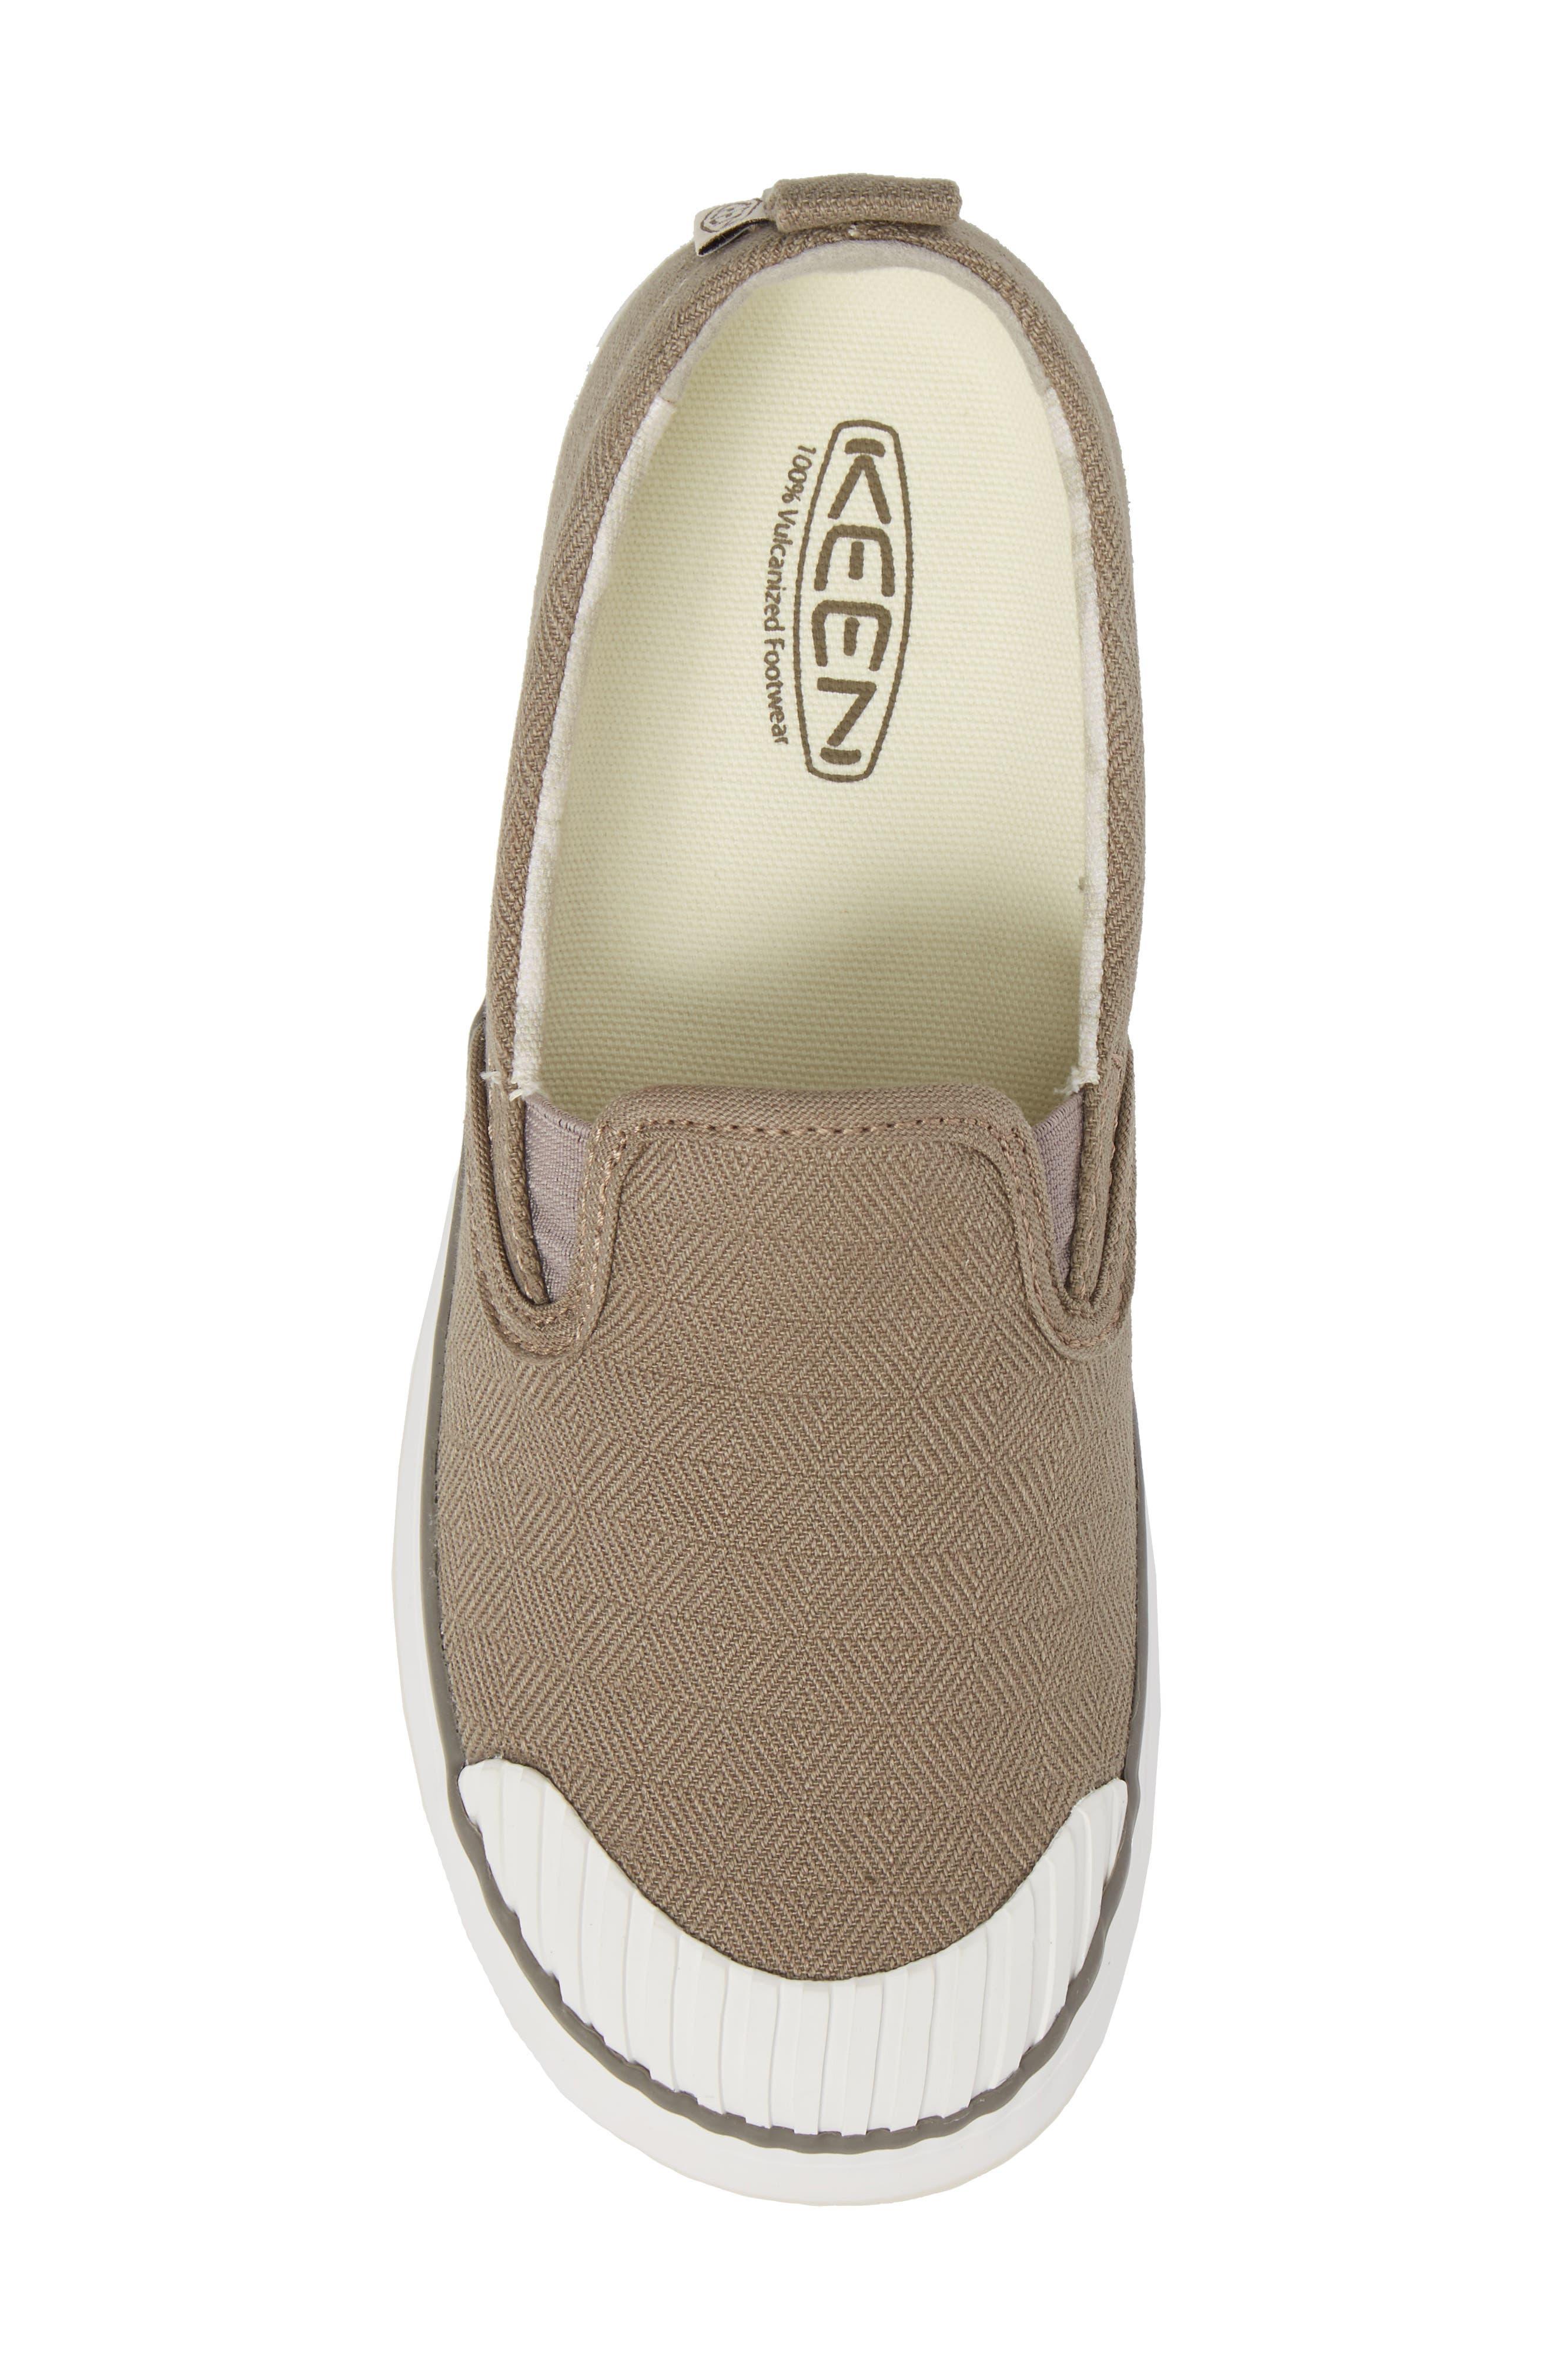 Elsa Slip-On Sneaker,                             Alternate thumbnail 5, color,                             Brindle